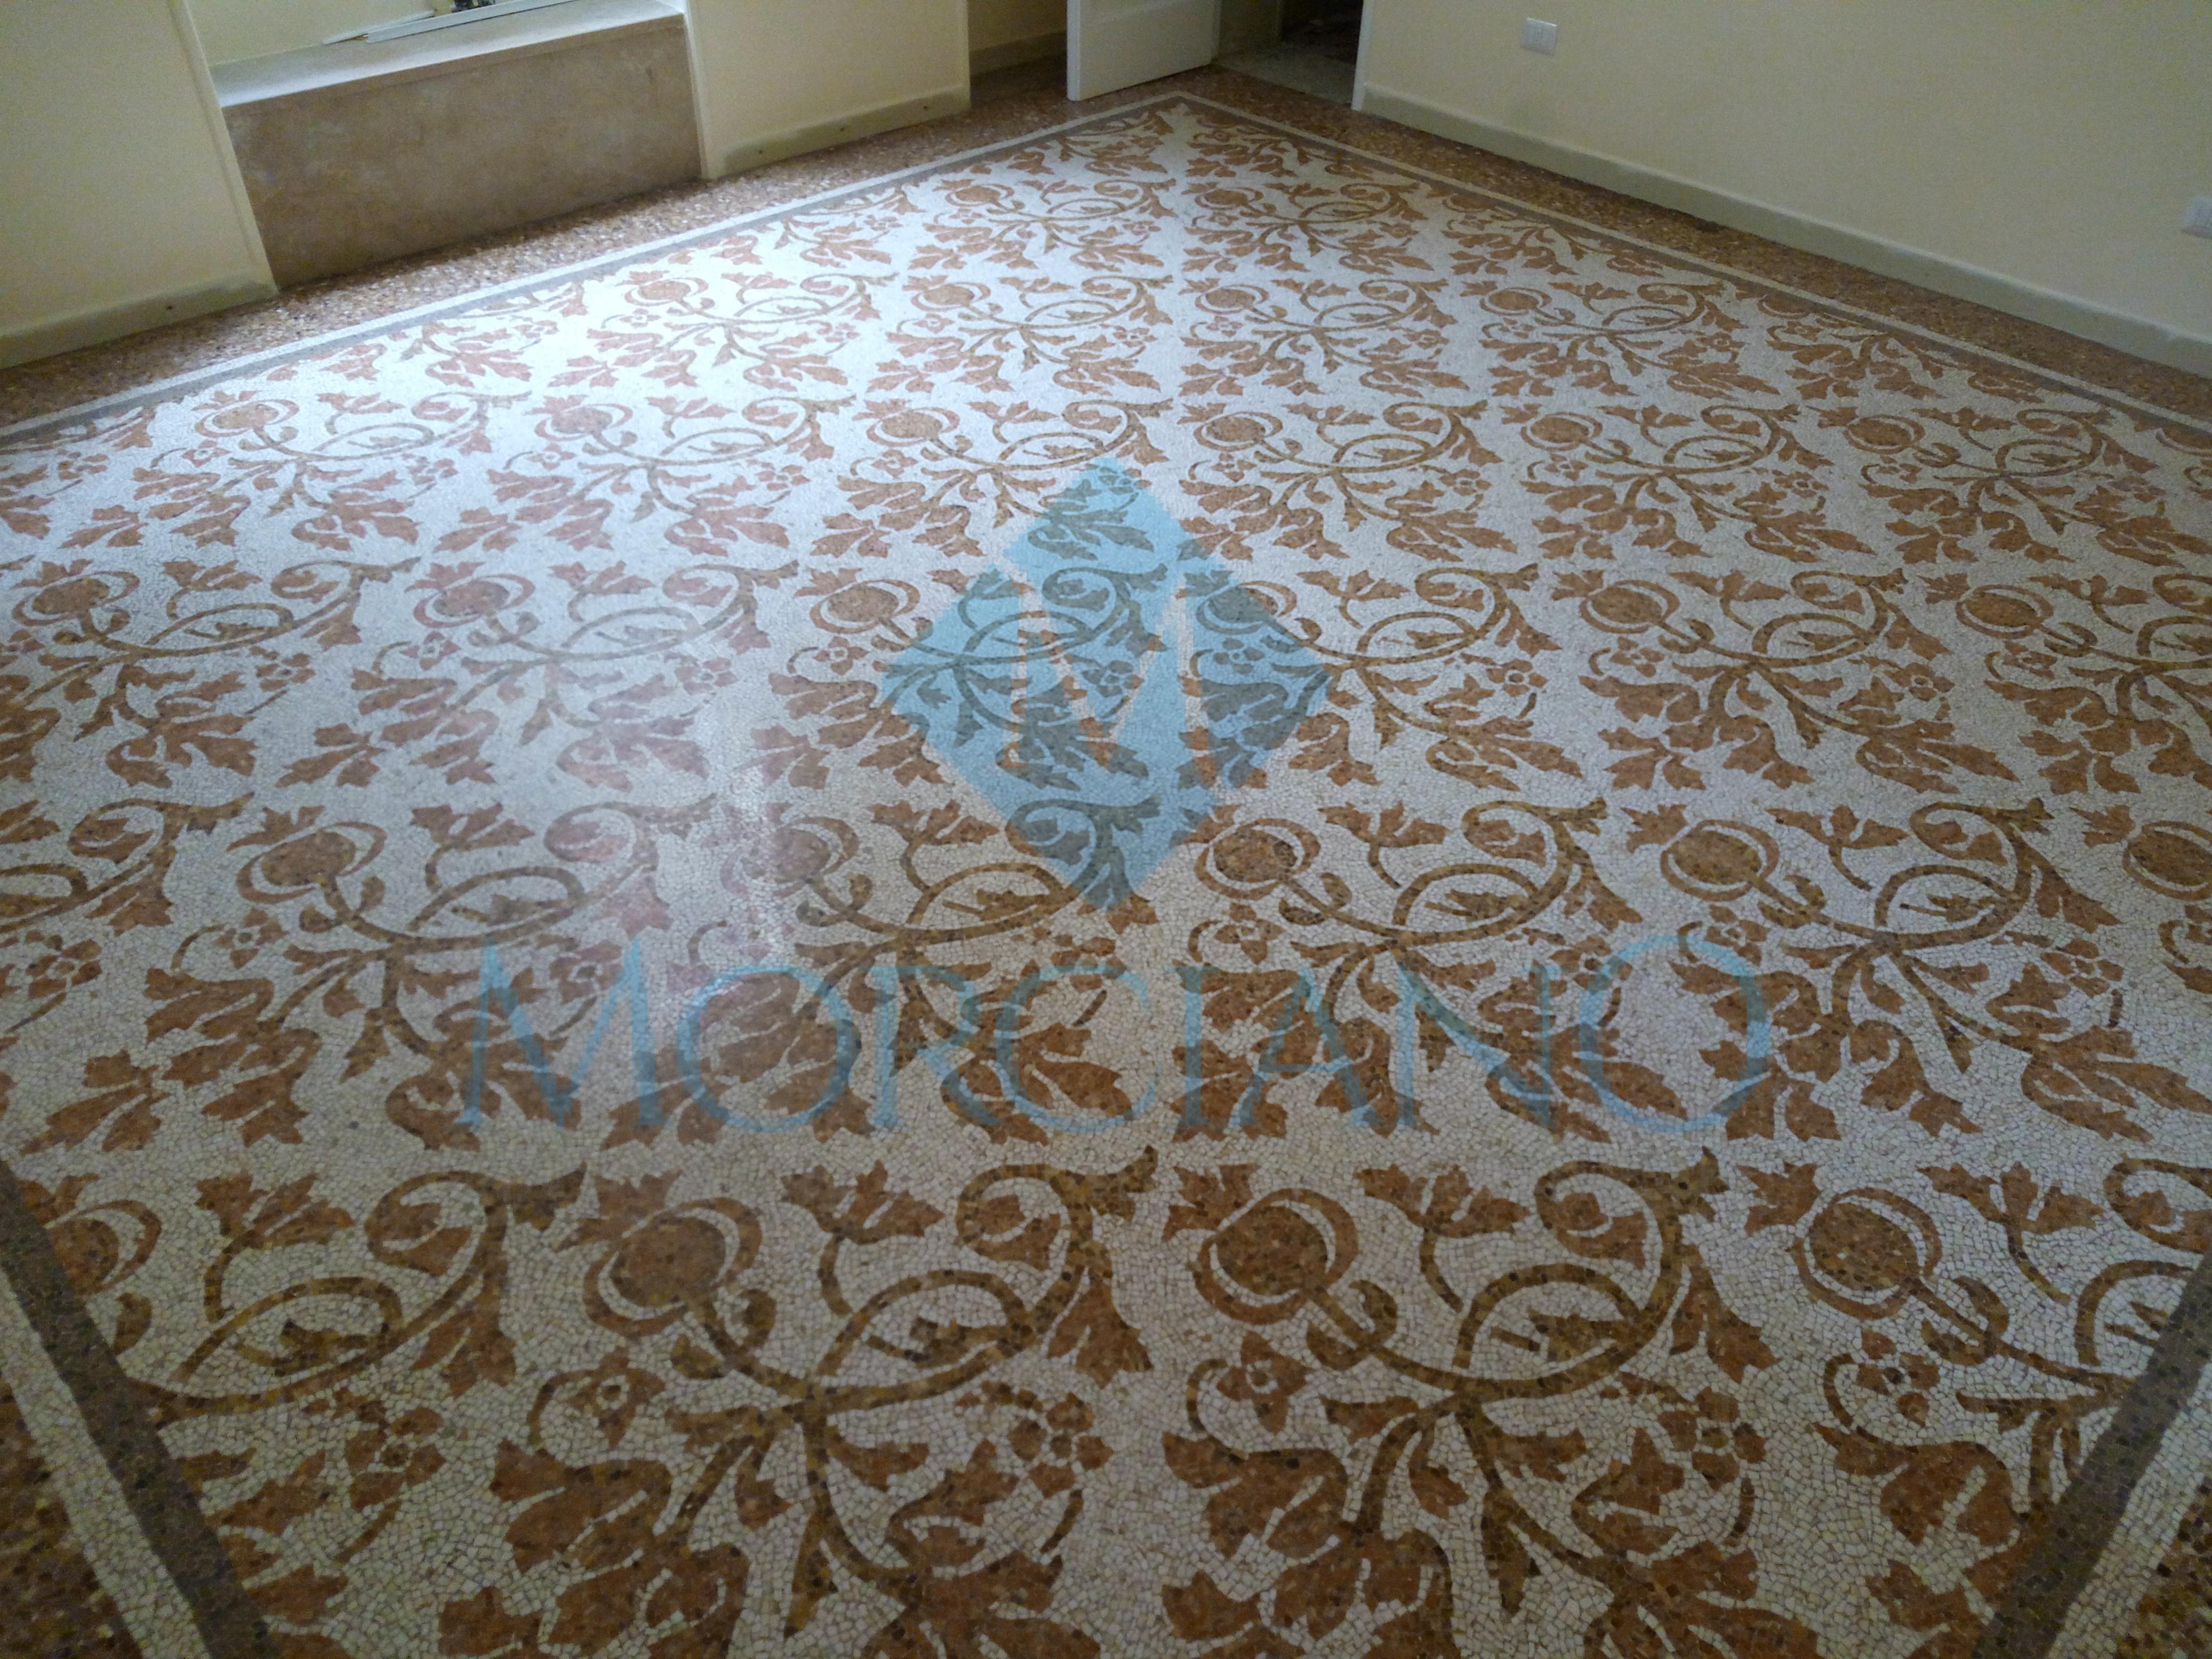 Levigatura e lucidatura di un pavimento a mosaico